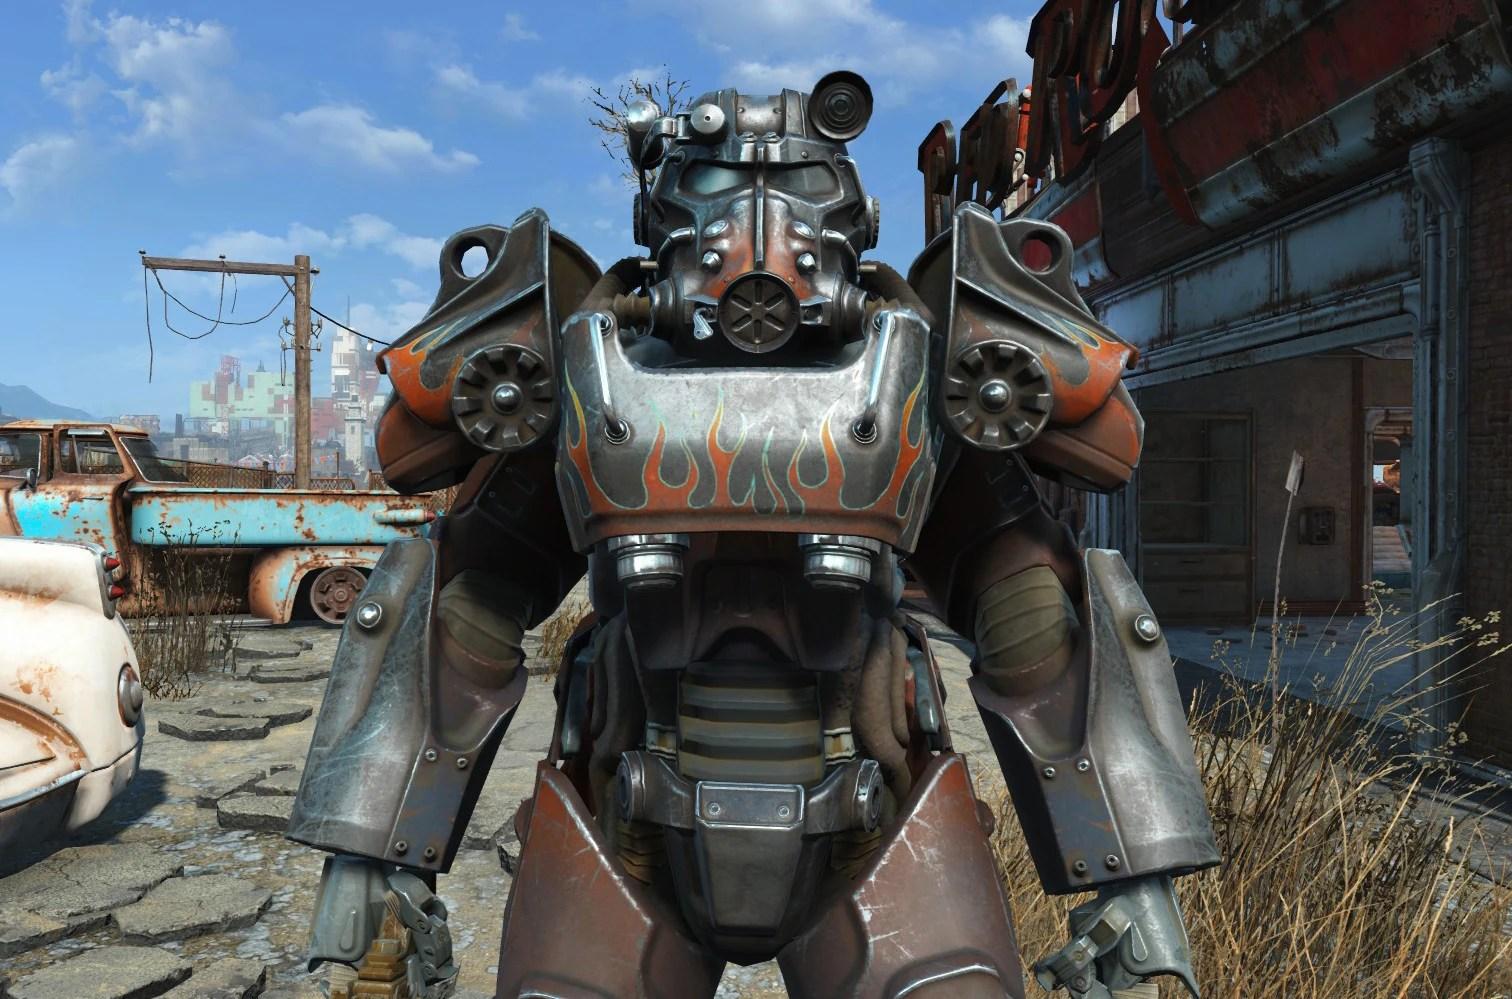 Duke (Fallout 4) | Fallout Wiki | FANDOM powered by Wikia